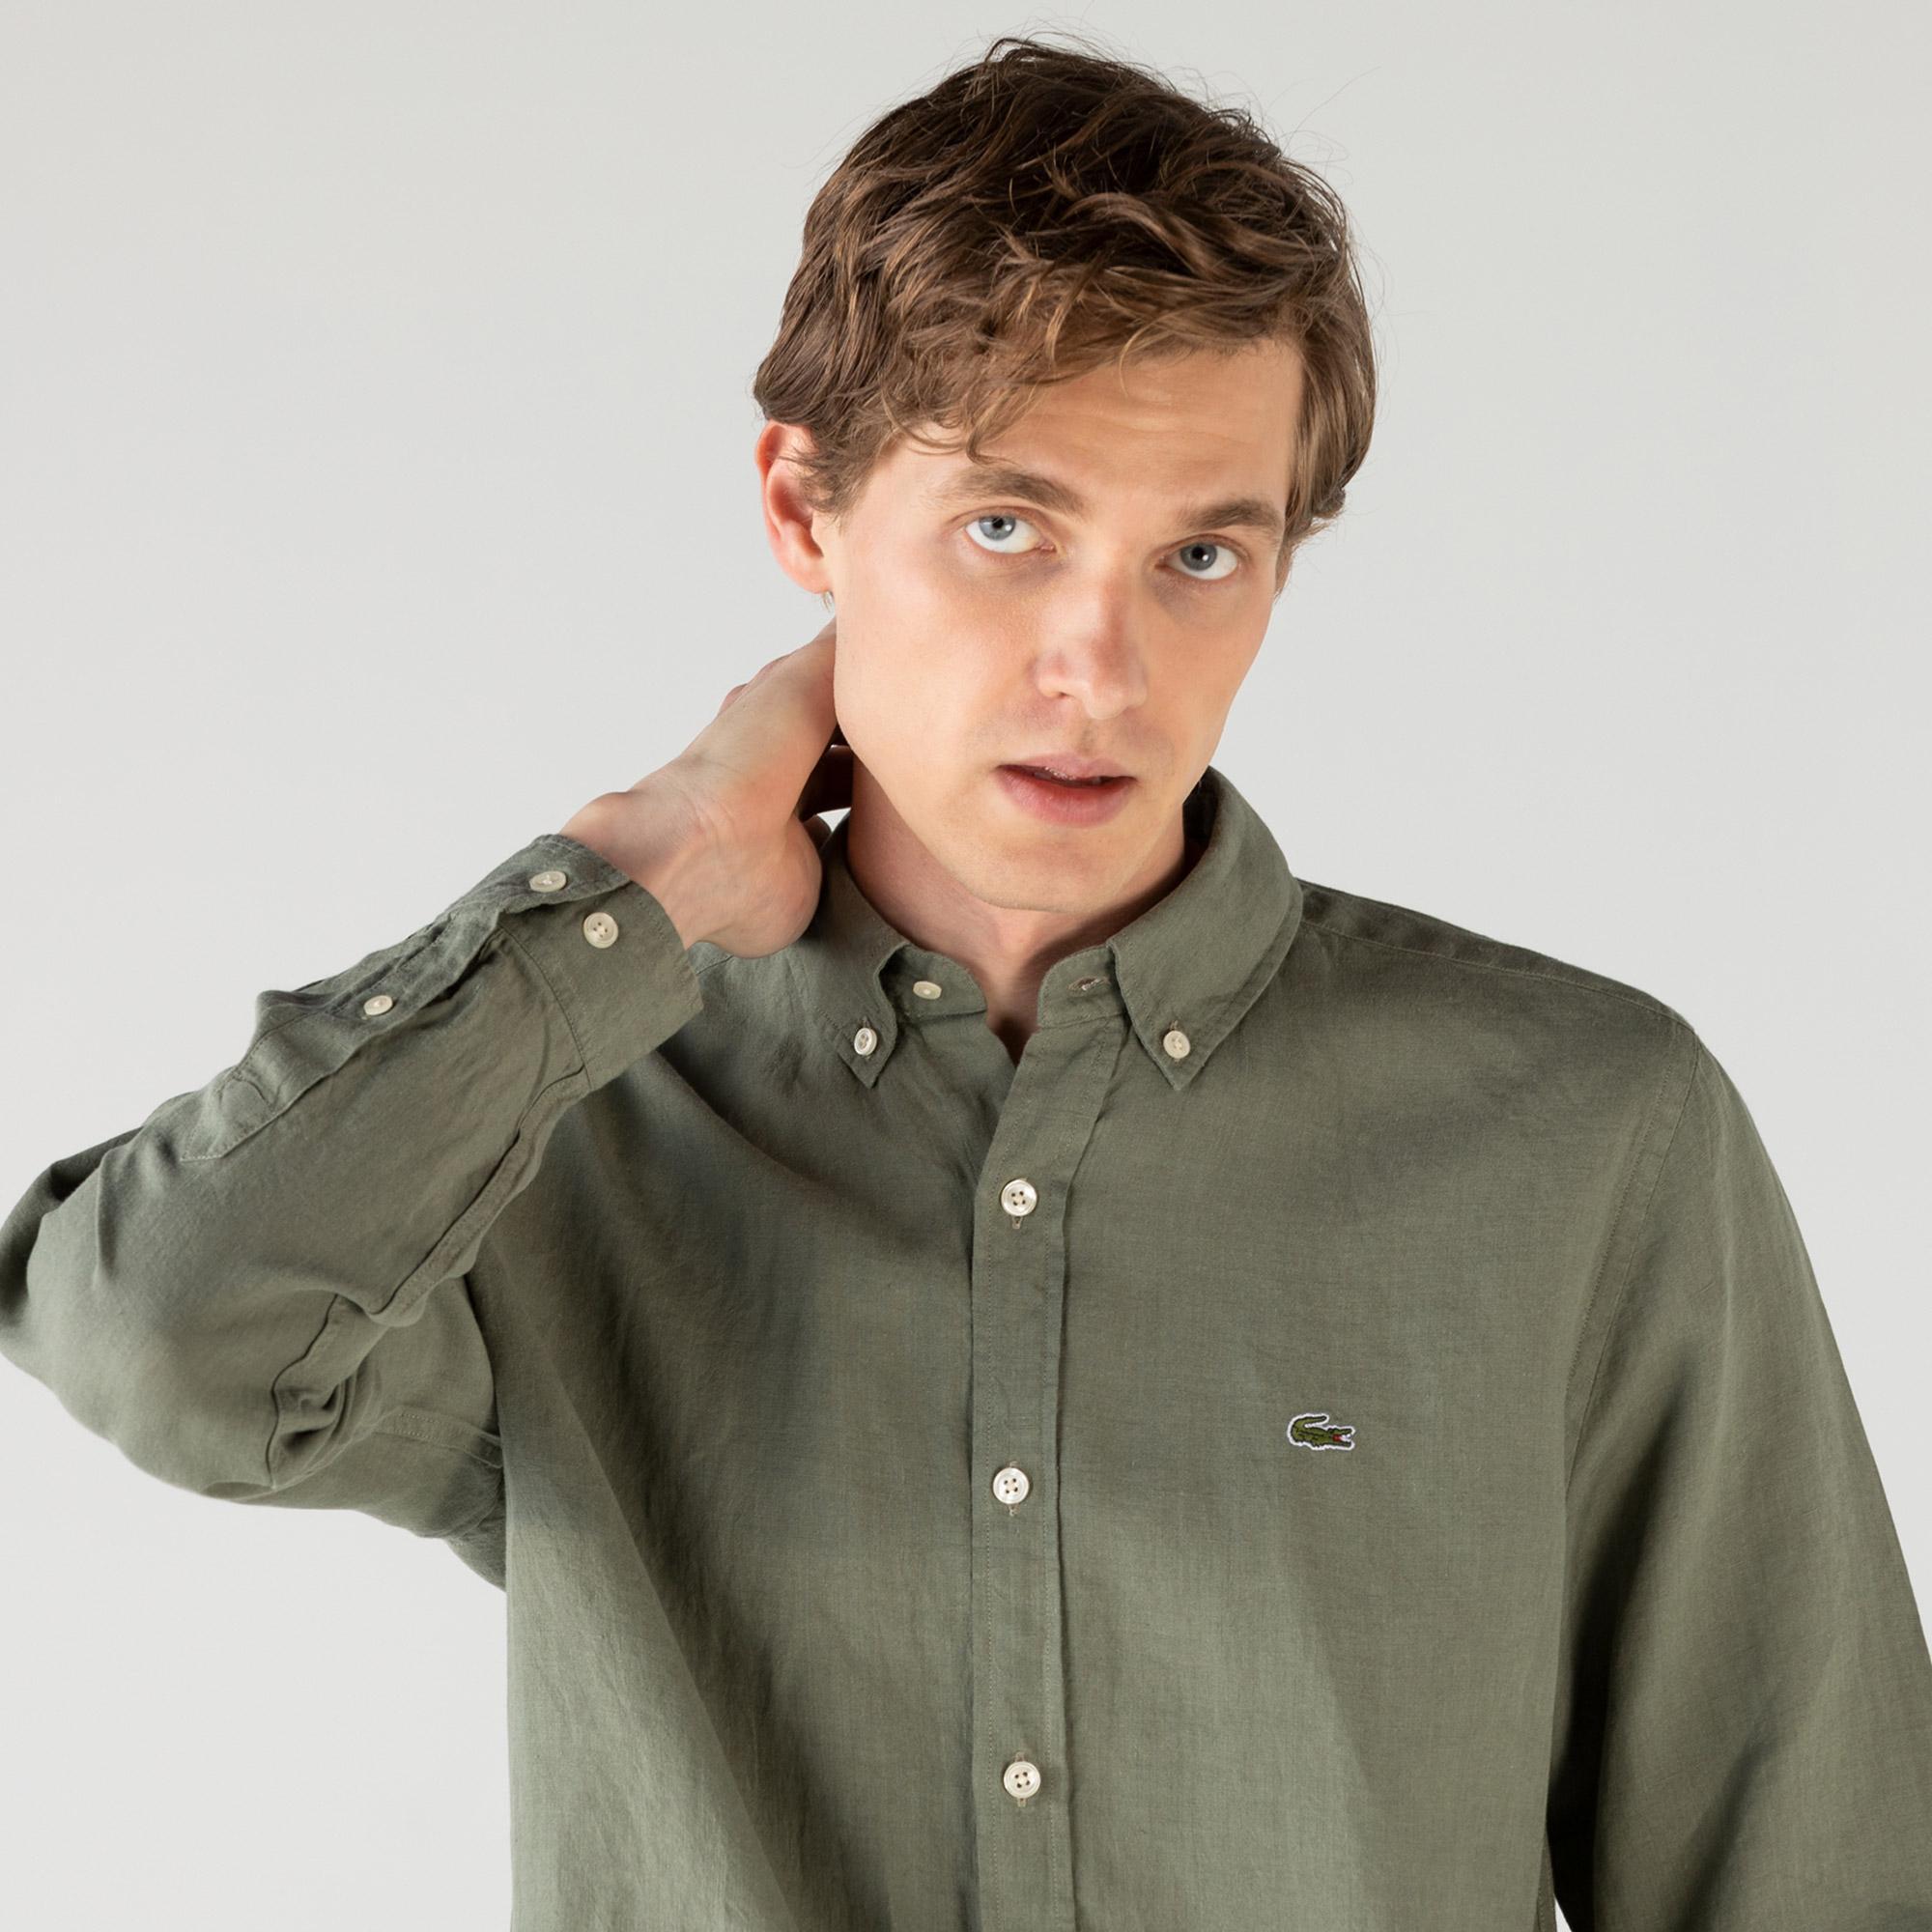 Lacoste Erkek Regular Fit Keten Haki Gömlek